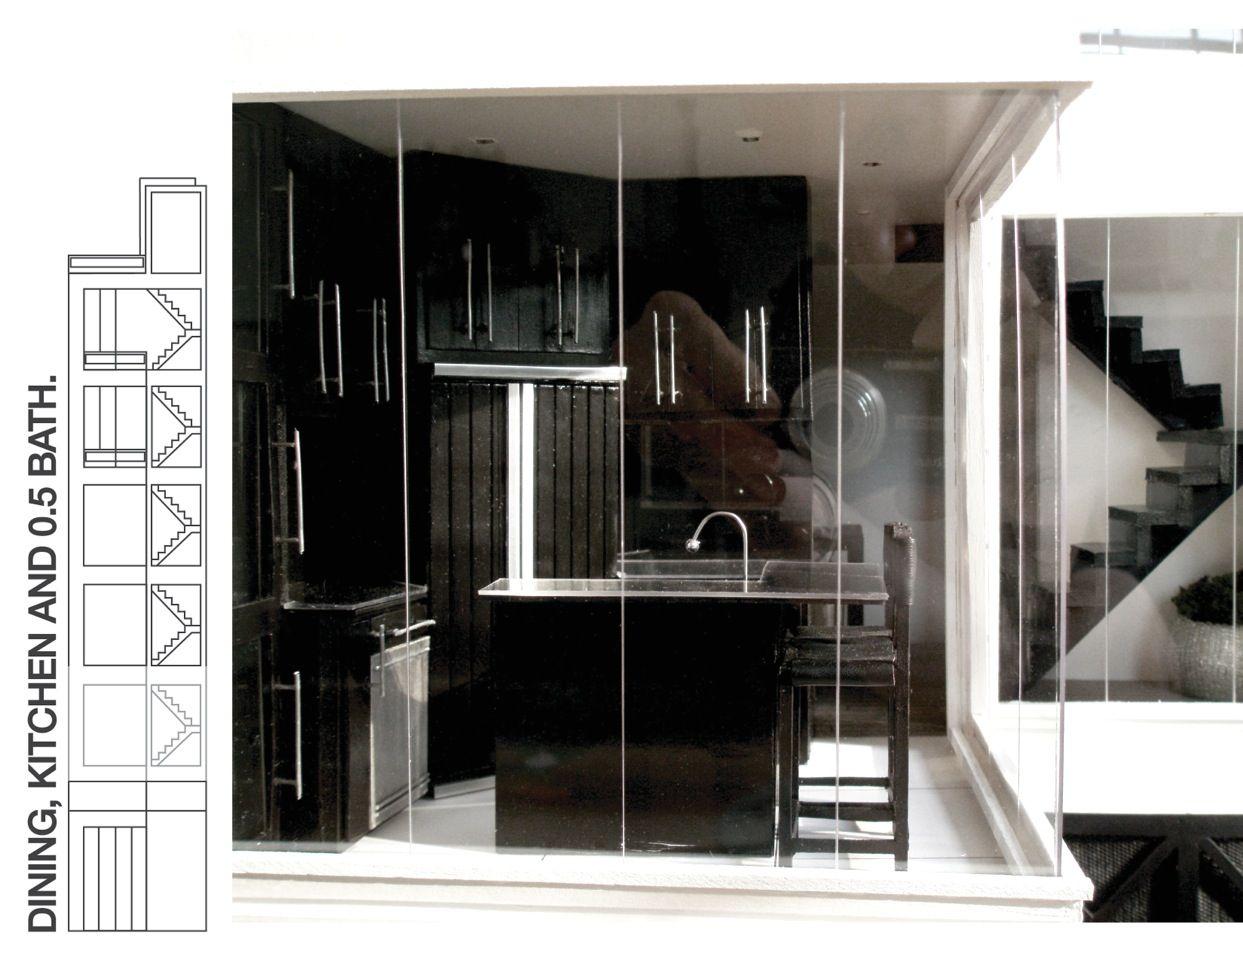 Mini Modern | The Great KITCHEN Caper! | Pinterest | Dollhouses ...